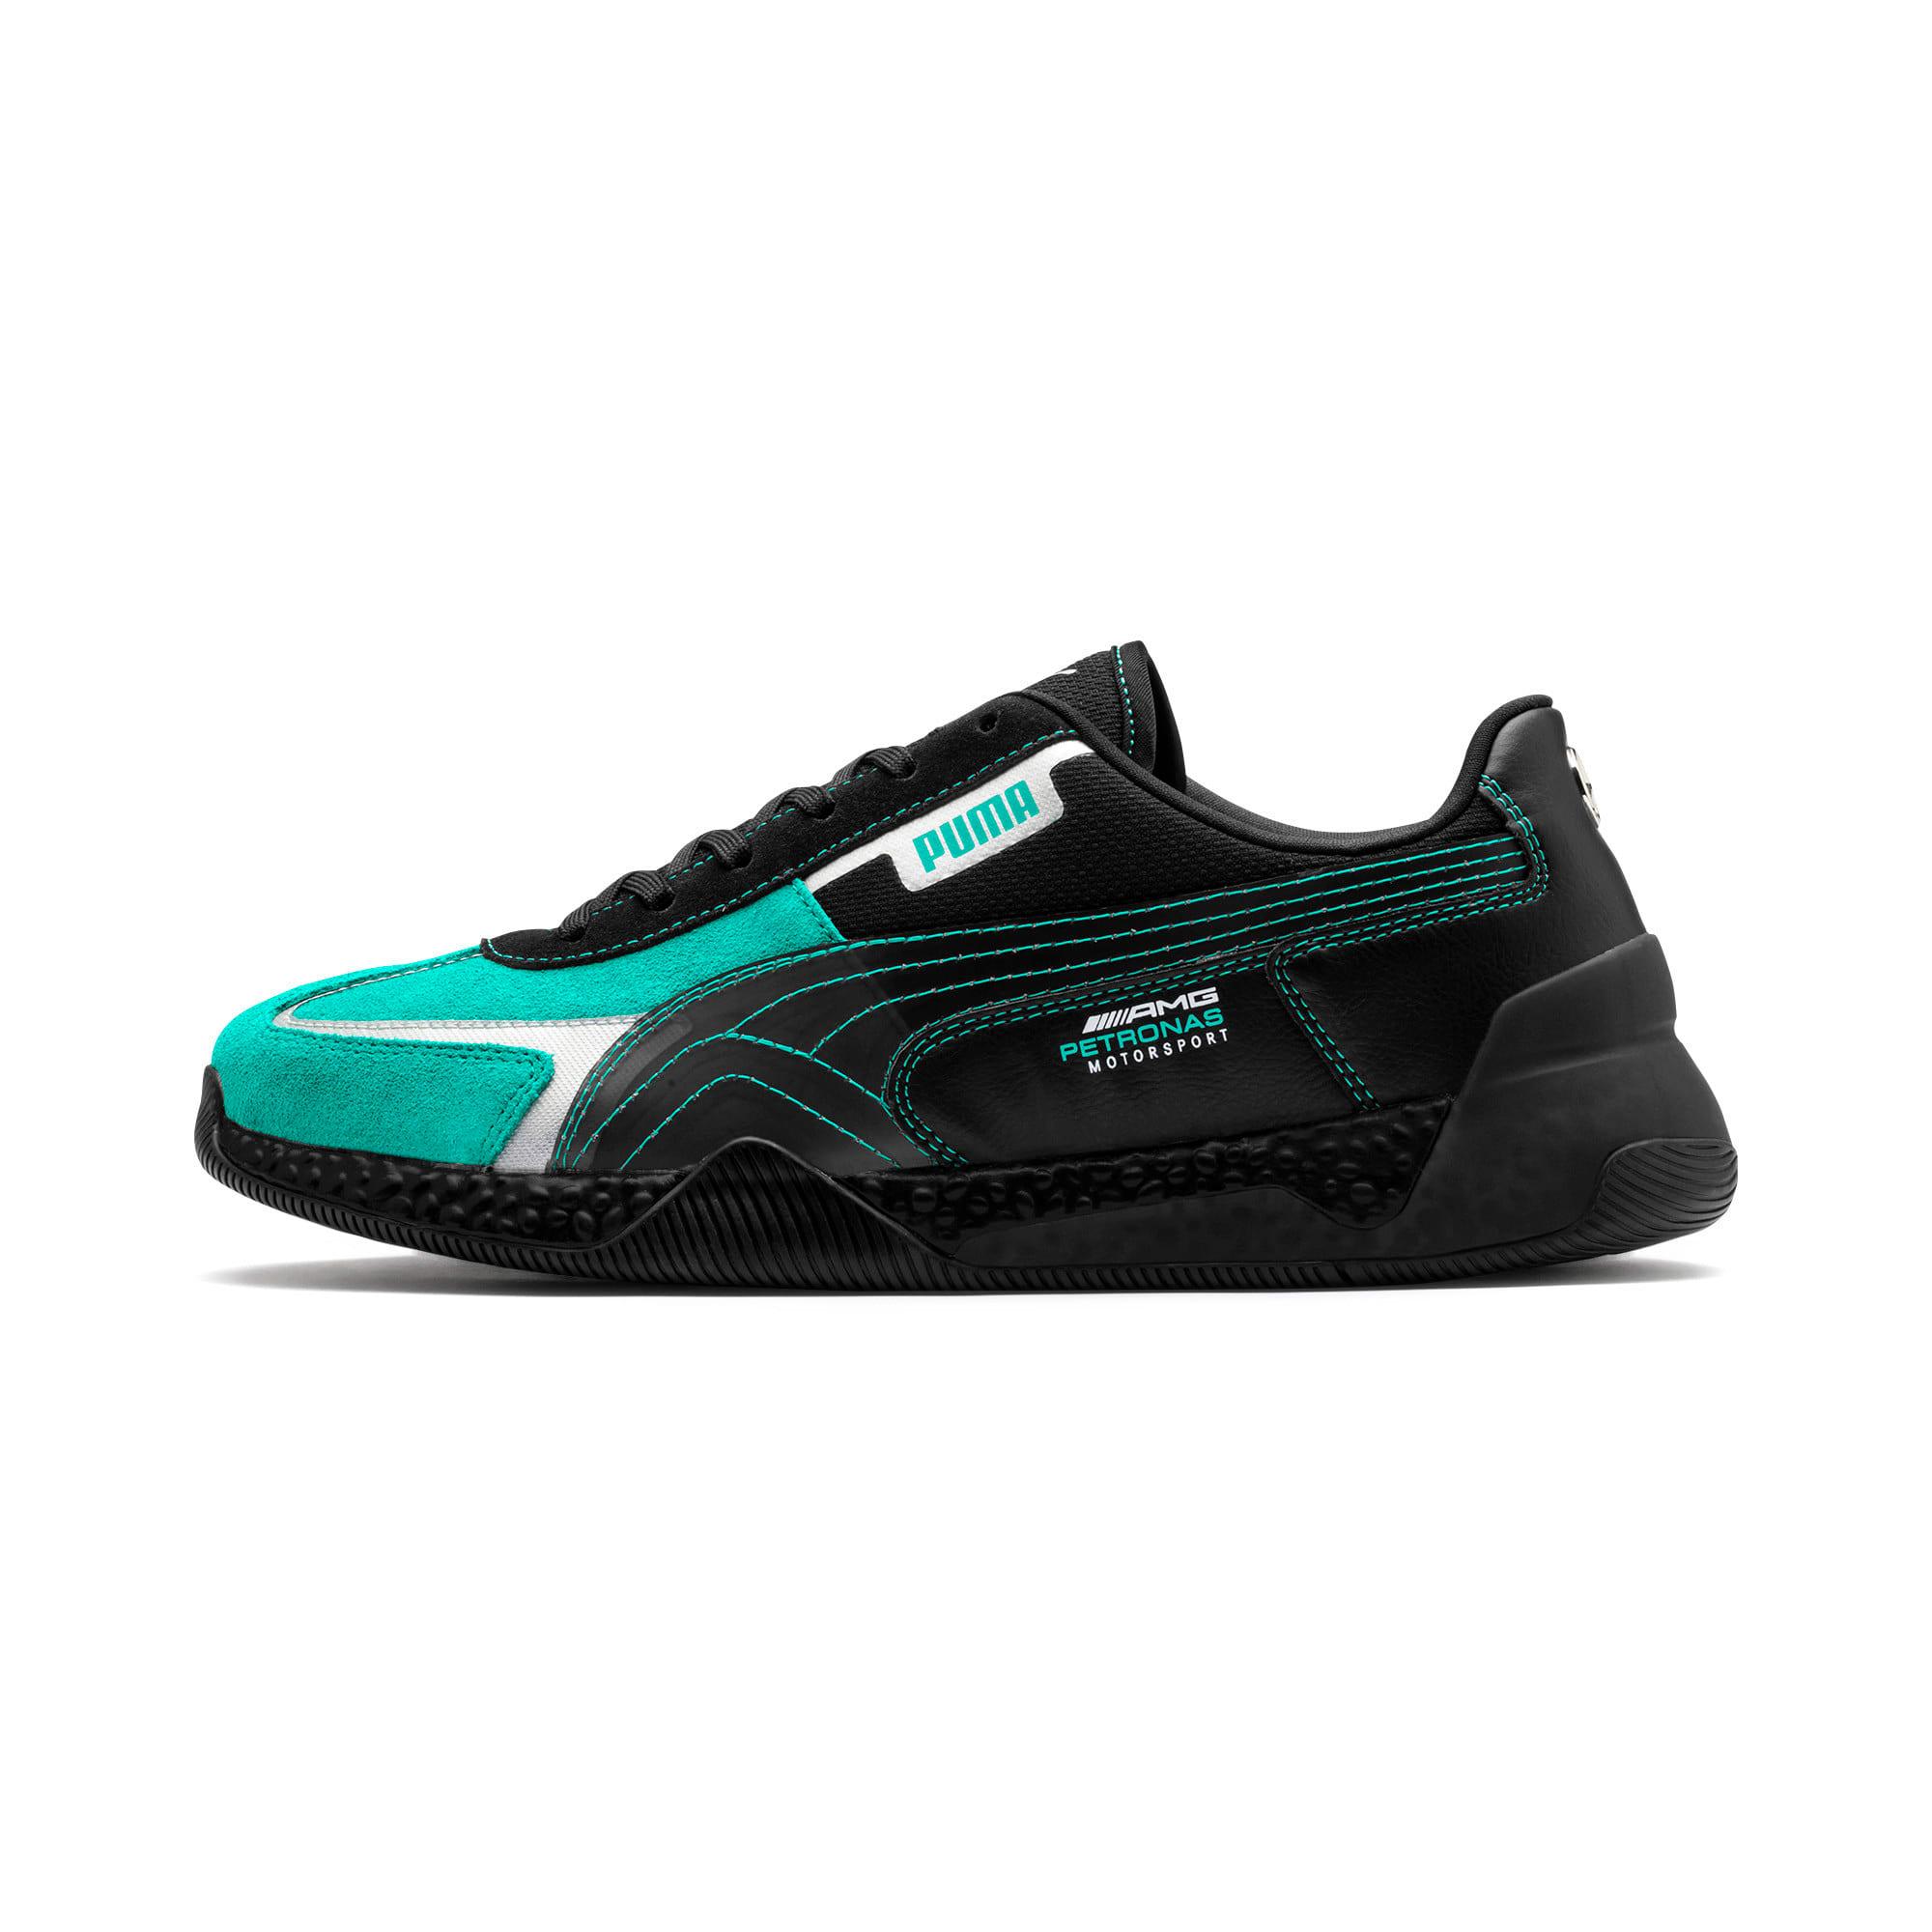 Thumbnail 1 of Mercedes AMG Petronas Speed HYBRID Running Shoes, Puma Black-Spectra Green, medium